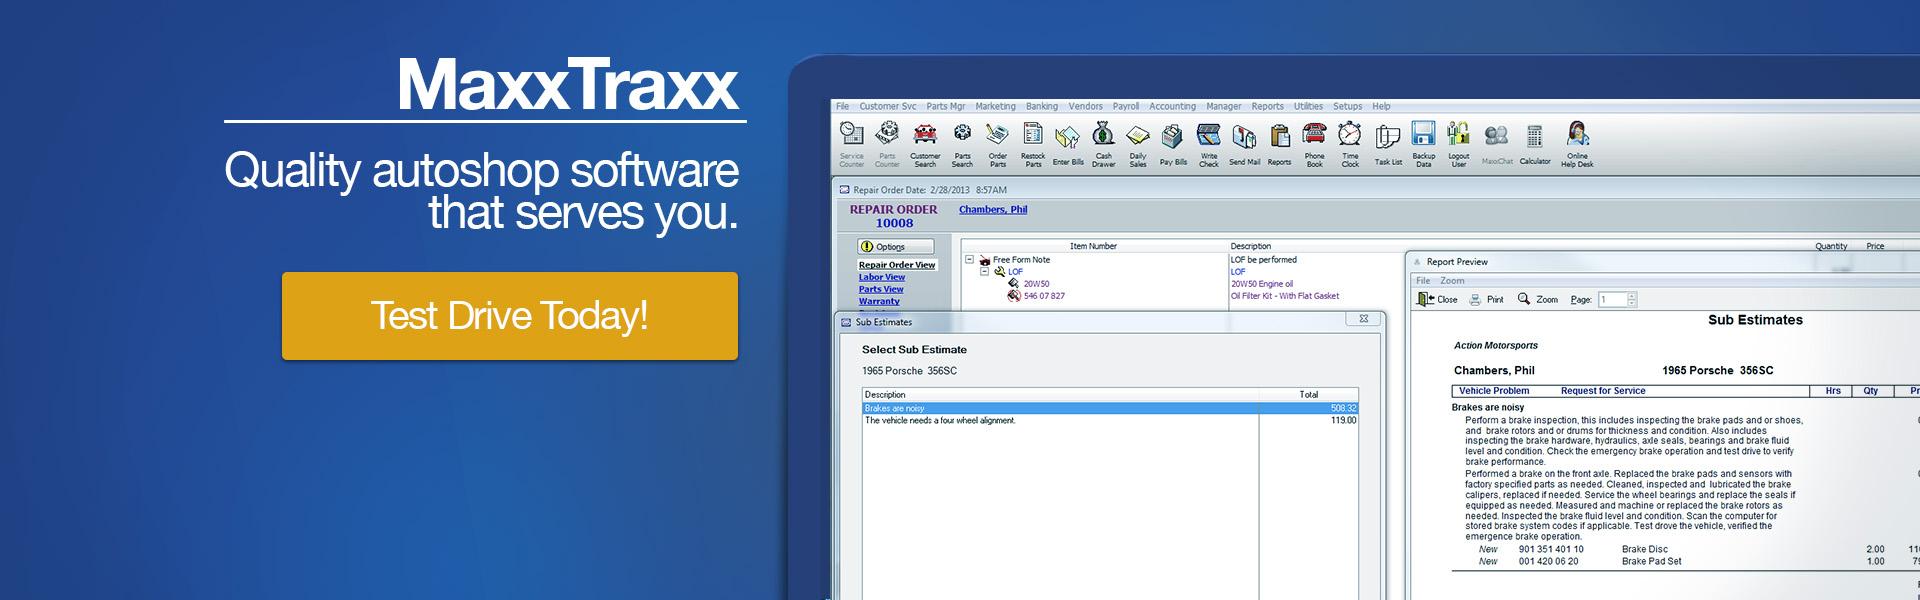 maxxtraxx is a best auto repair software choice for 2018 home